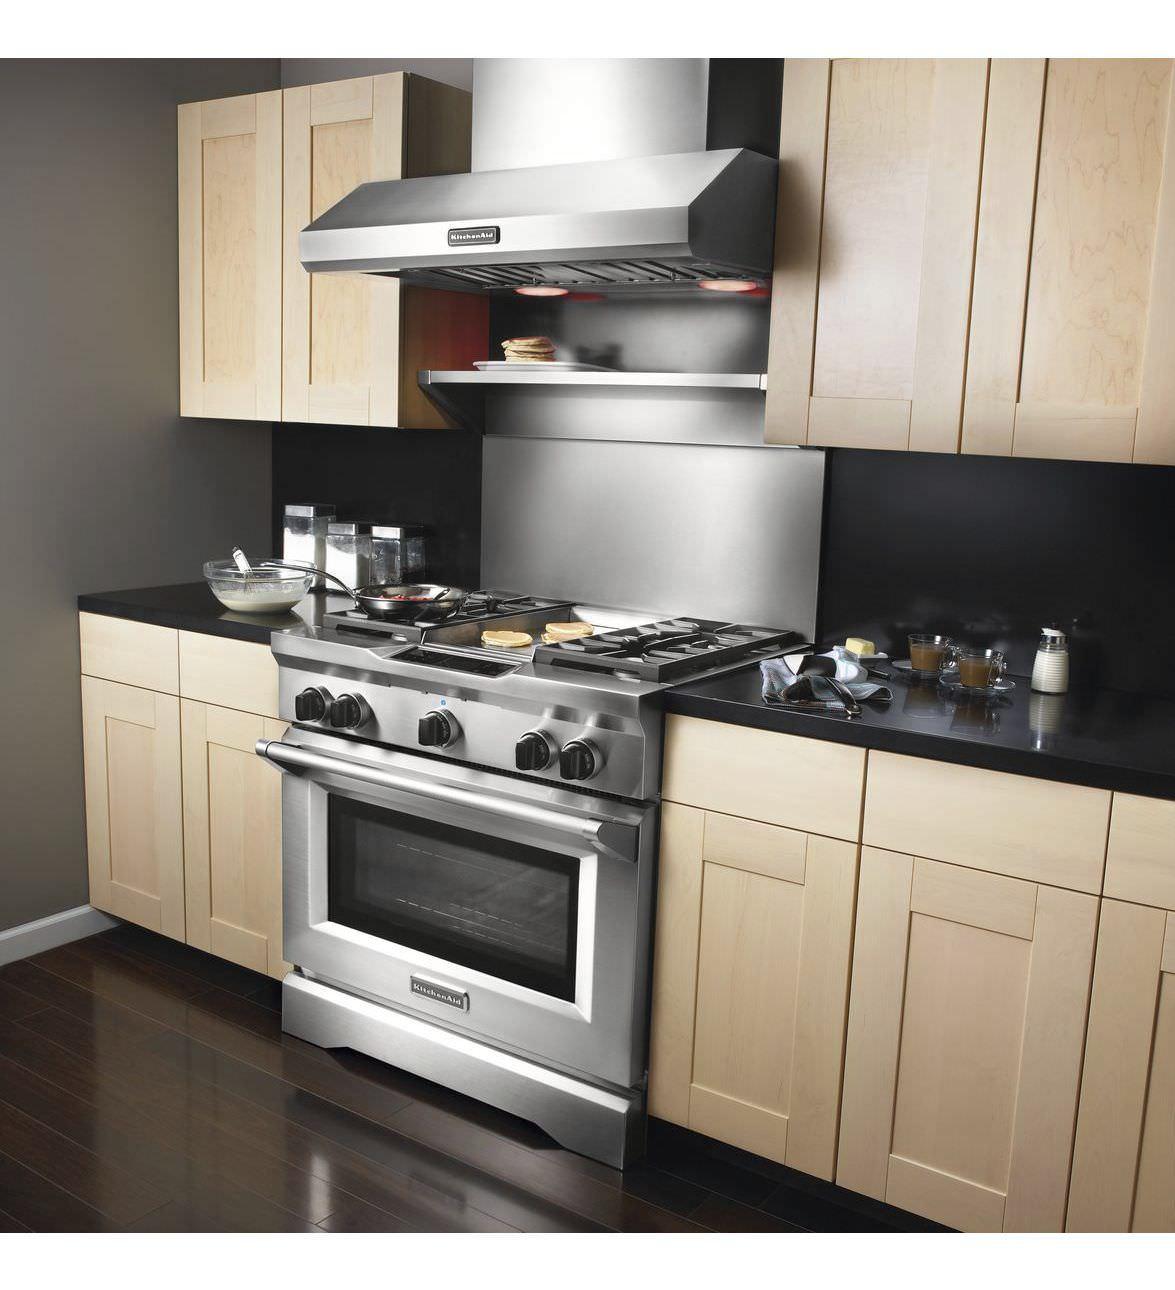 Gas range cooker / electric / dual-fuel - KDRU763VSS - KitchenAid